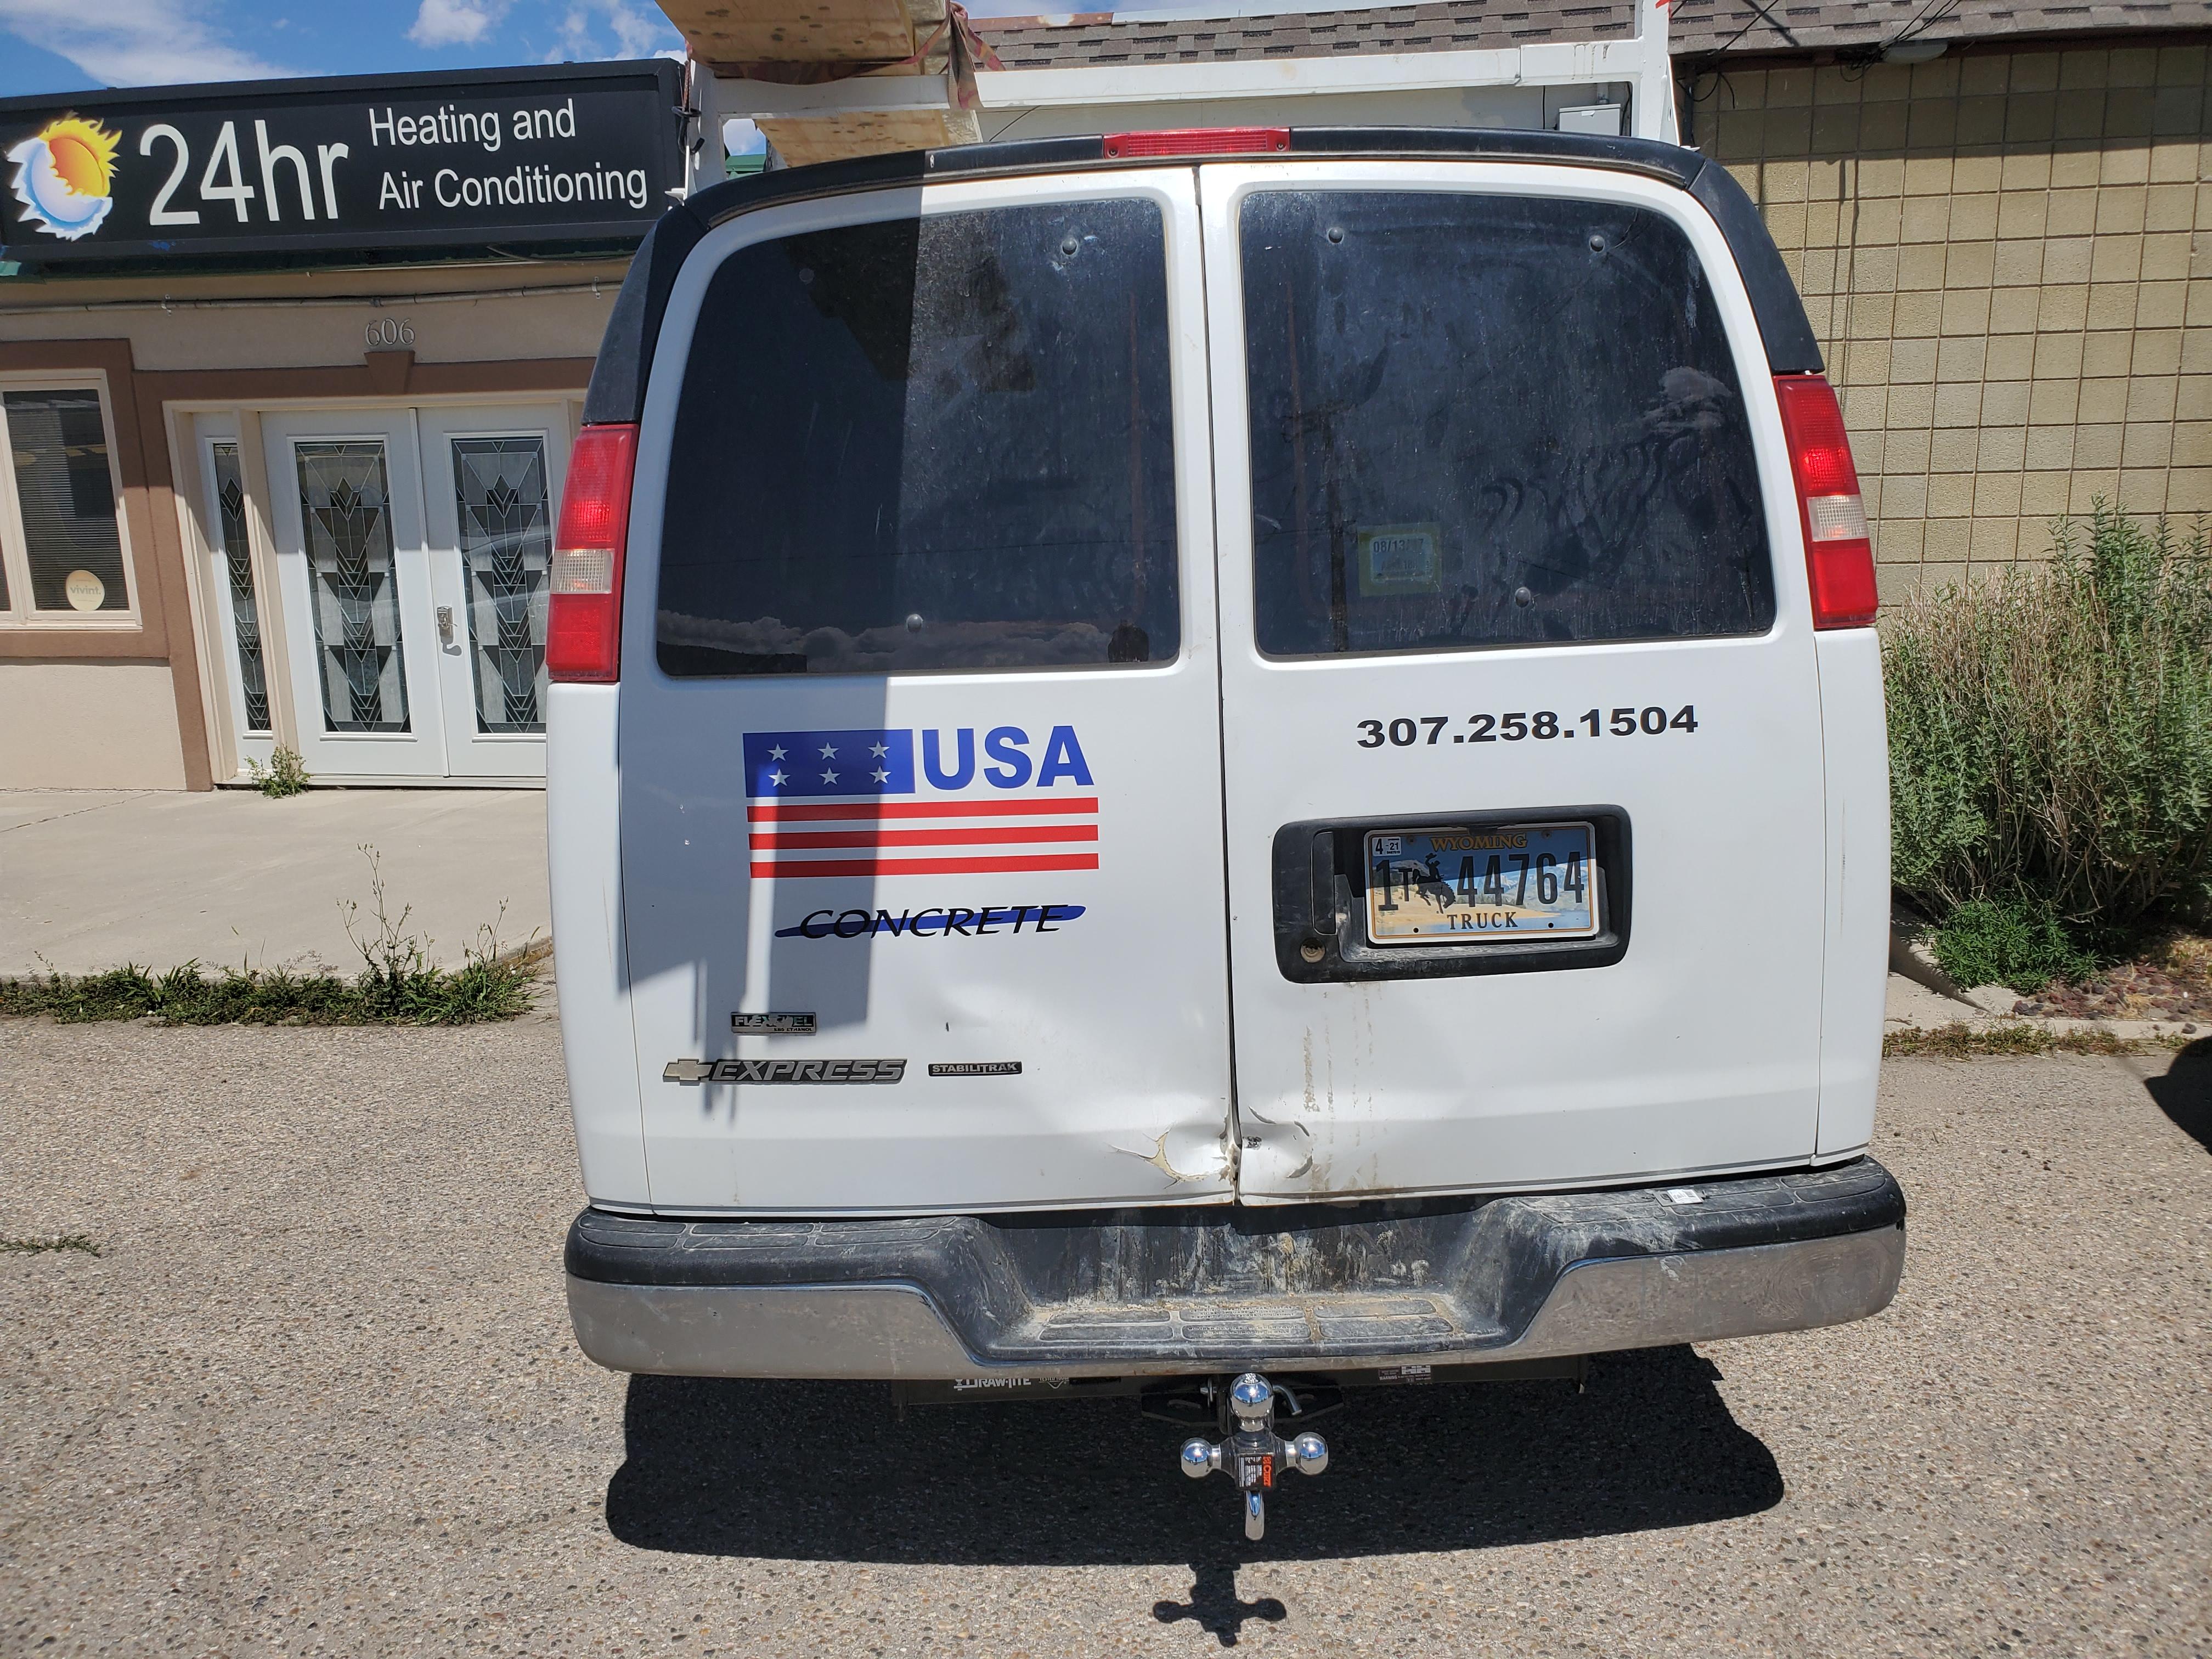 vehicle decals, concrete company, casper wyoming